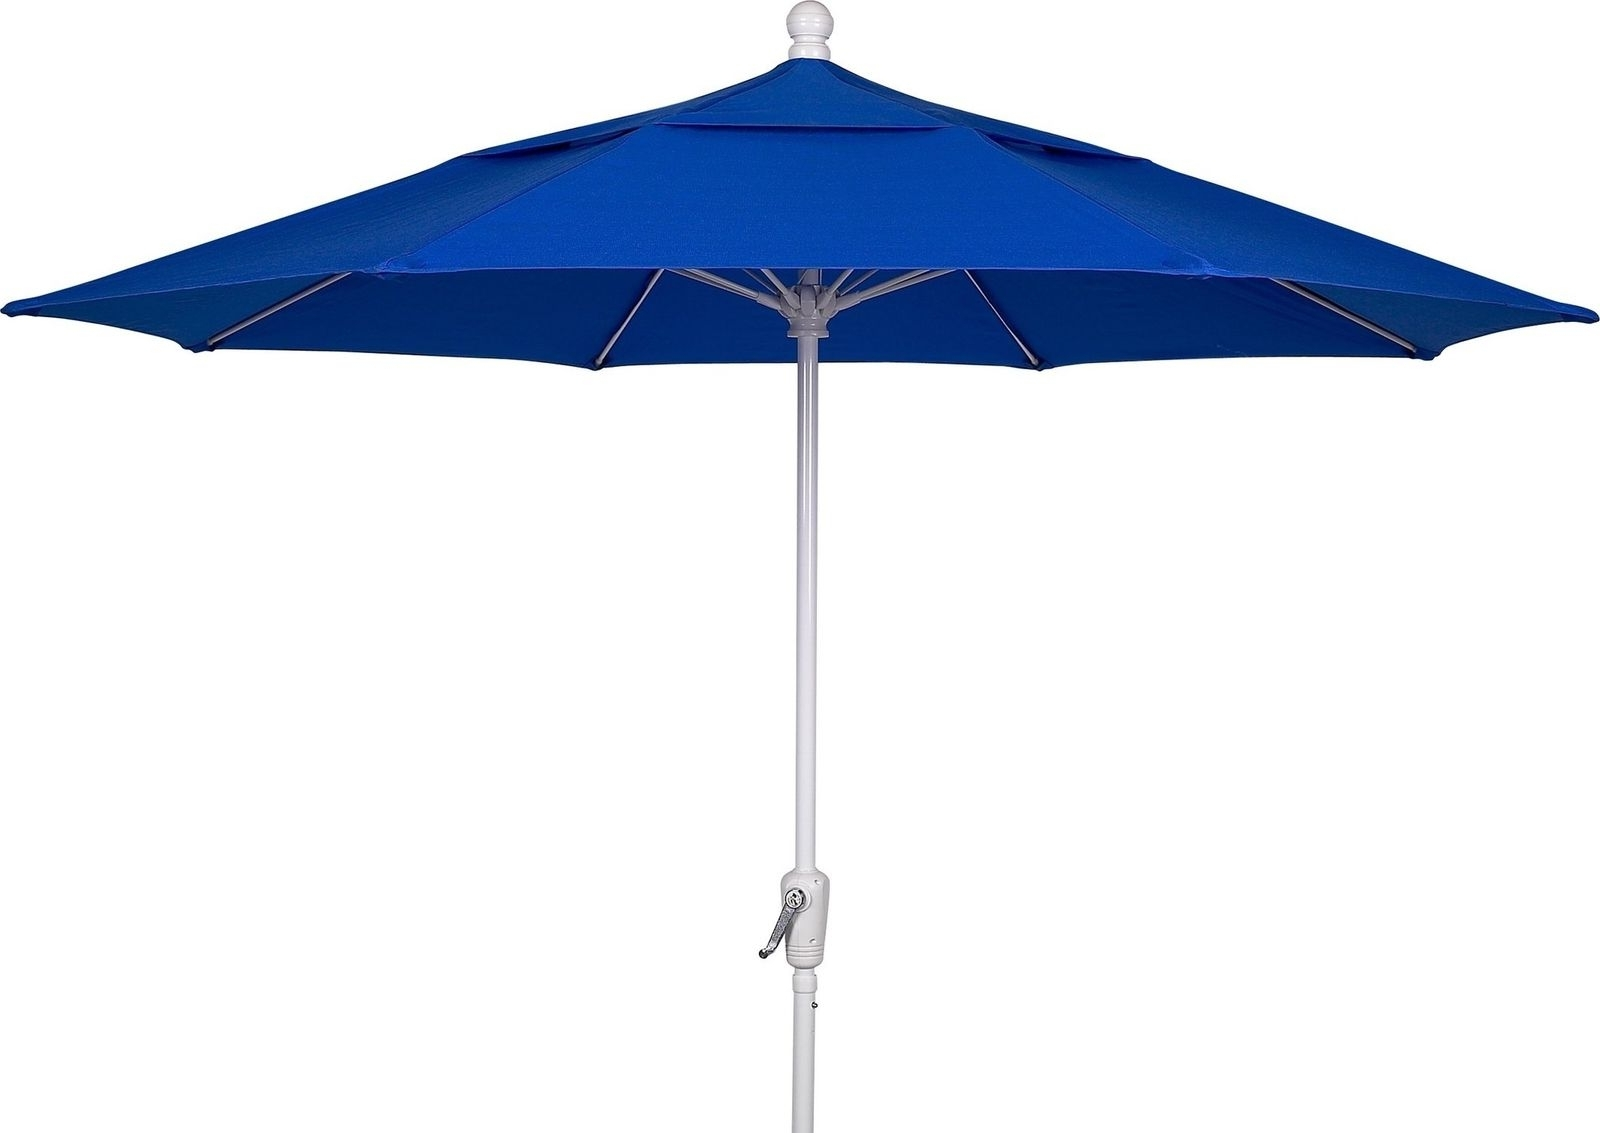 Fiberbuilt Umbrellas Patio Umbrella (View 4 of 20)